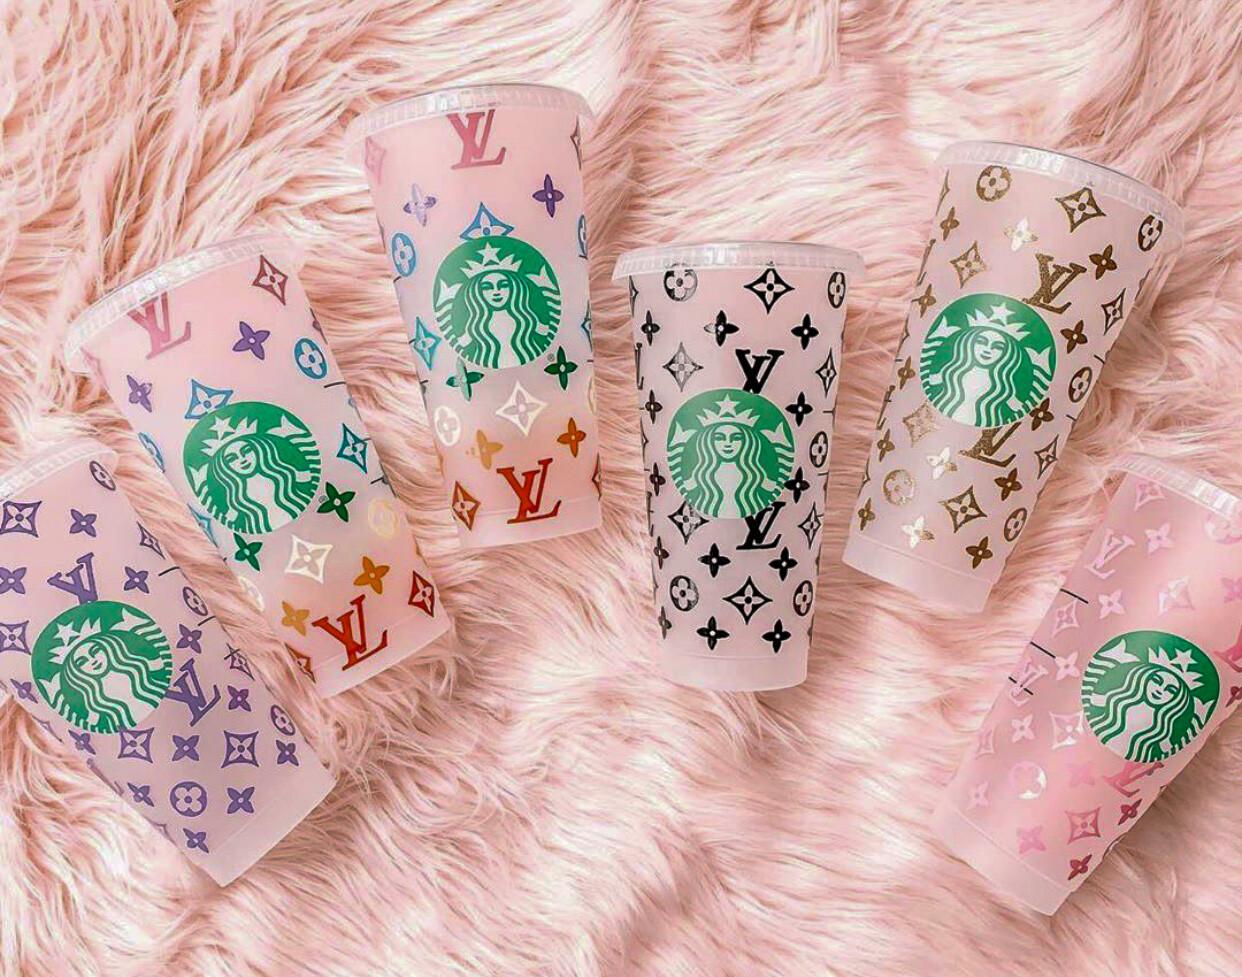 LV Starbucks Cups